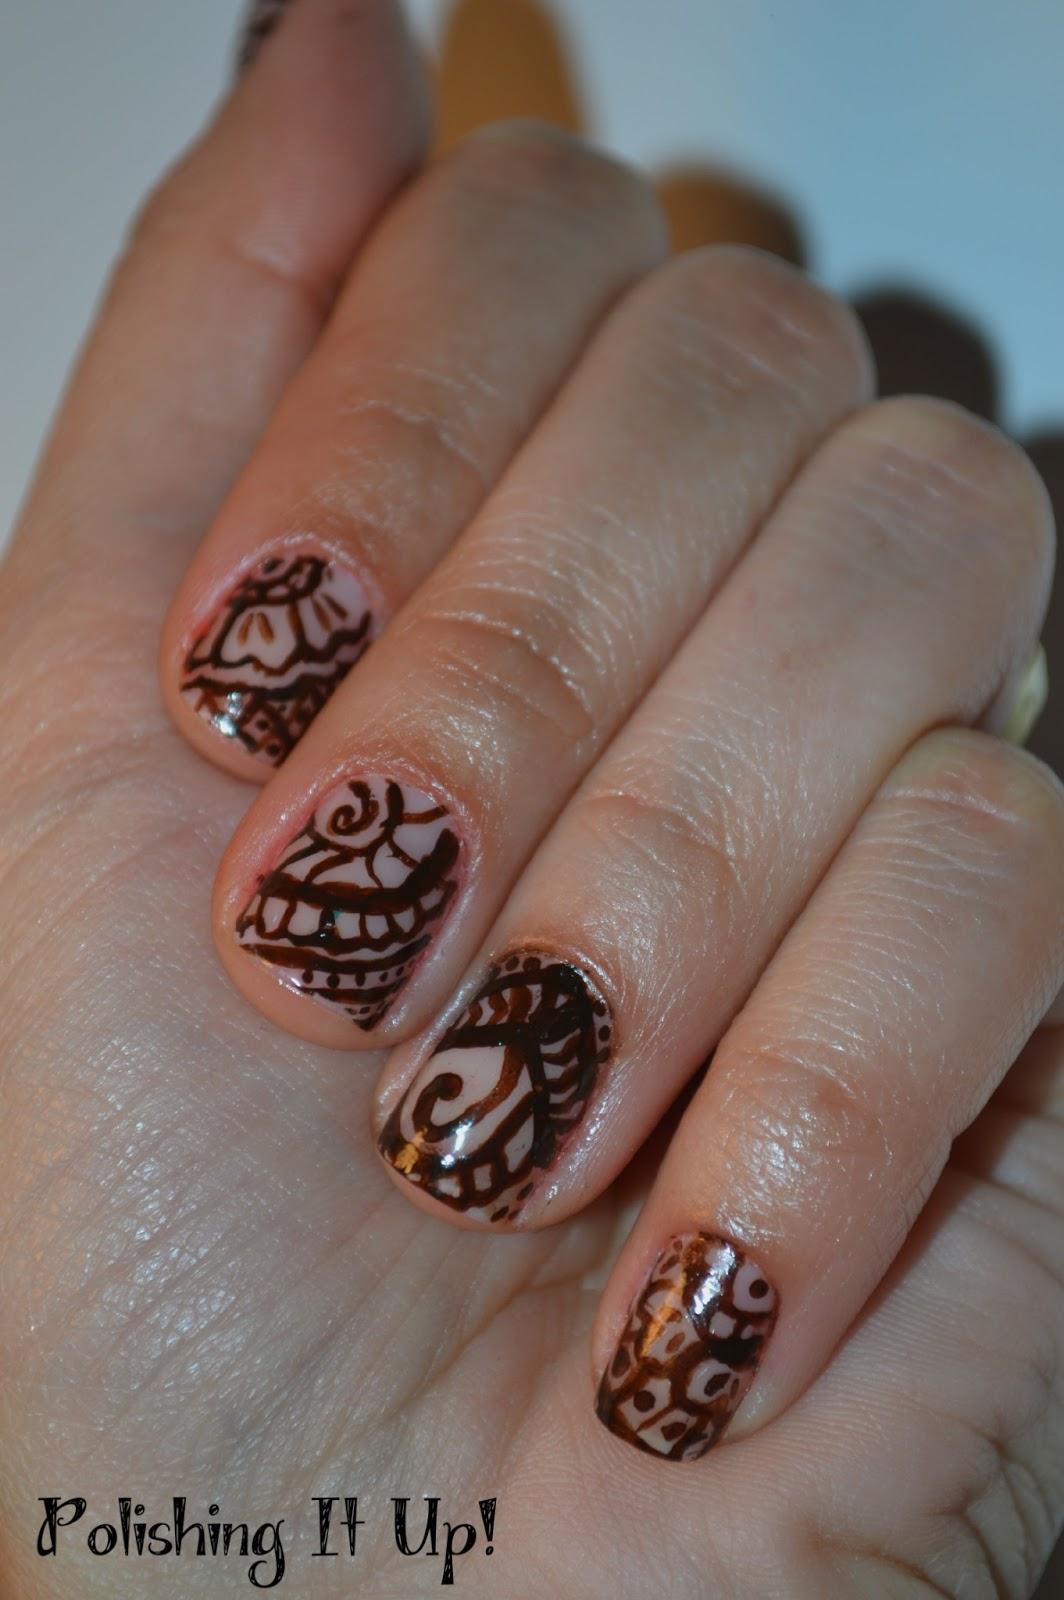 Polishing It Up!: Henna Designs: Nail Style